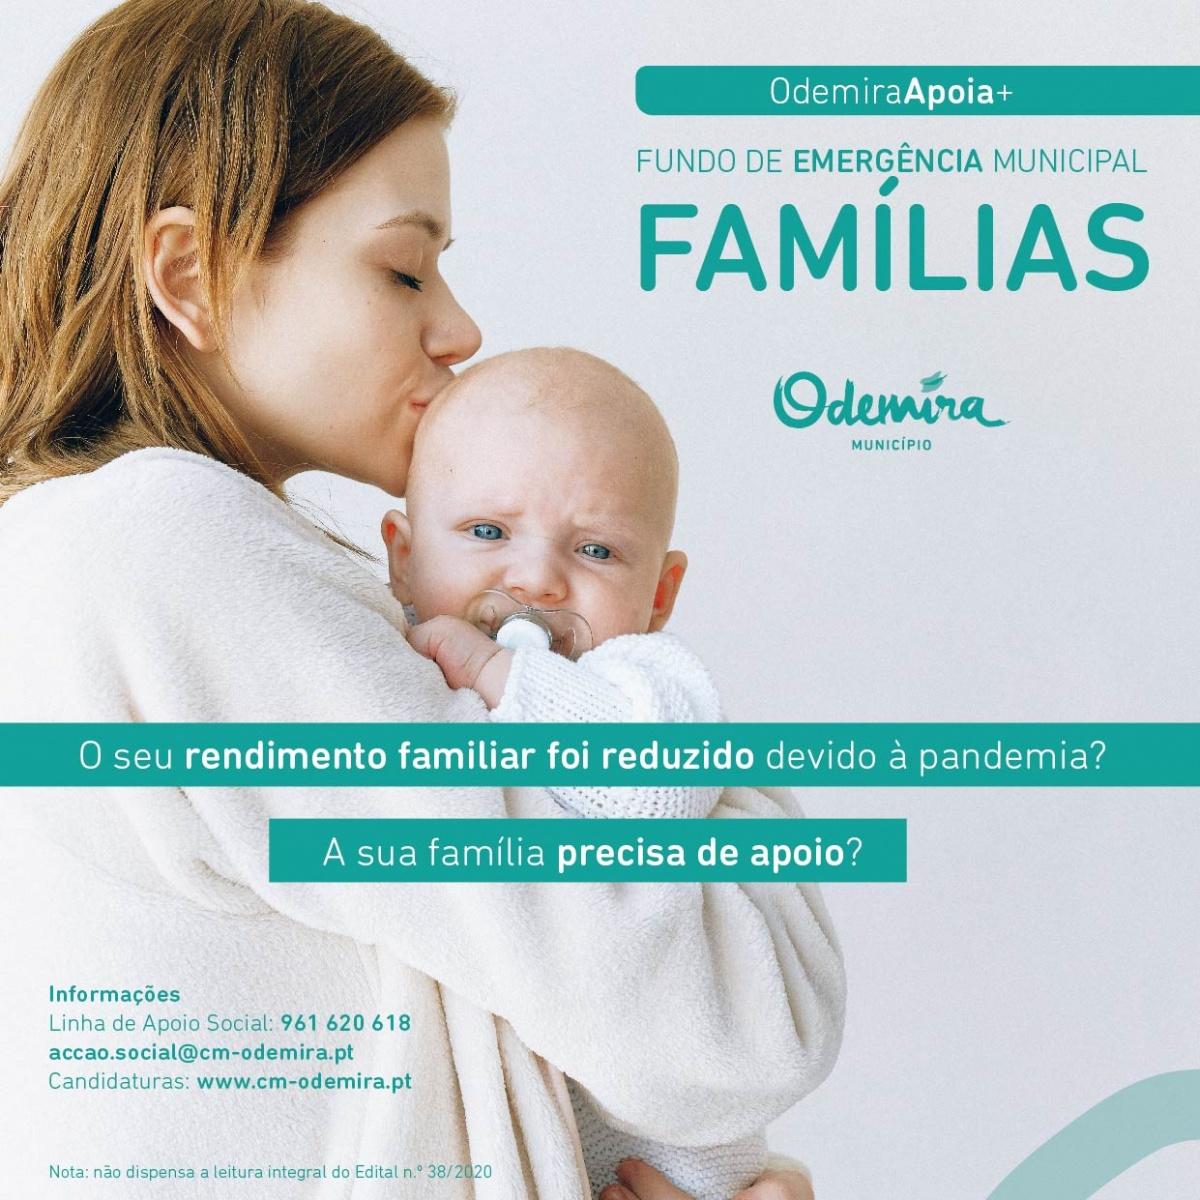 Fundo Emergencia familia Odemira